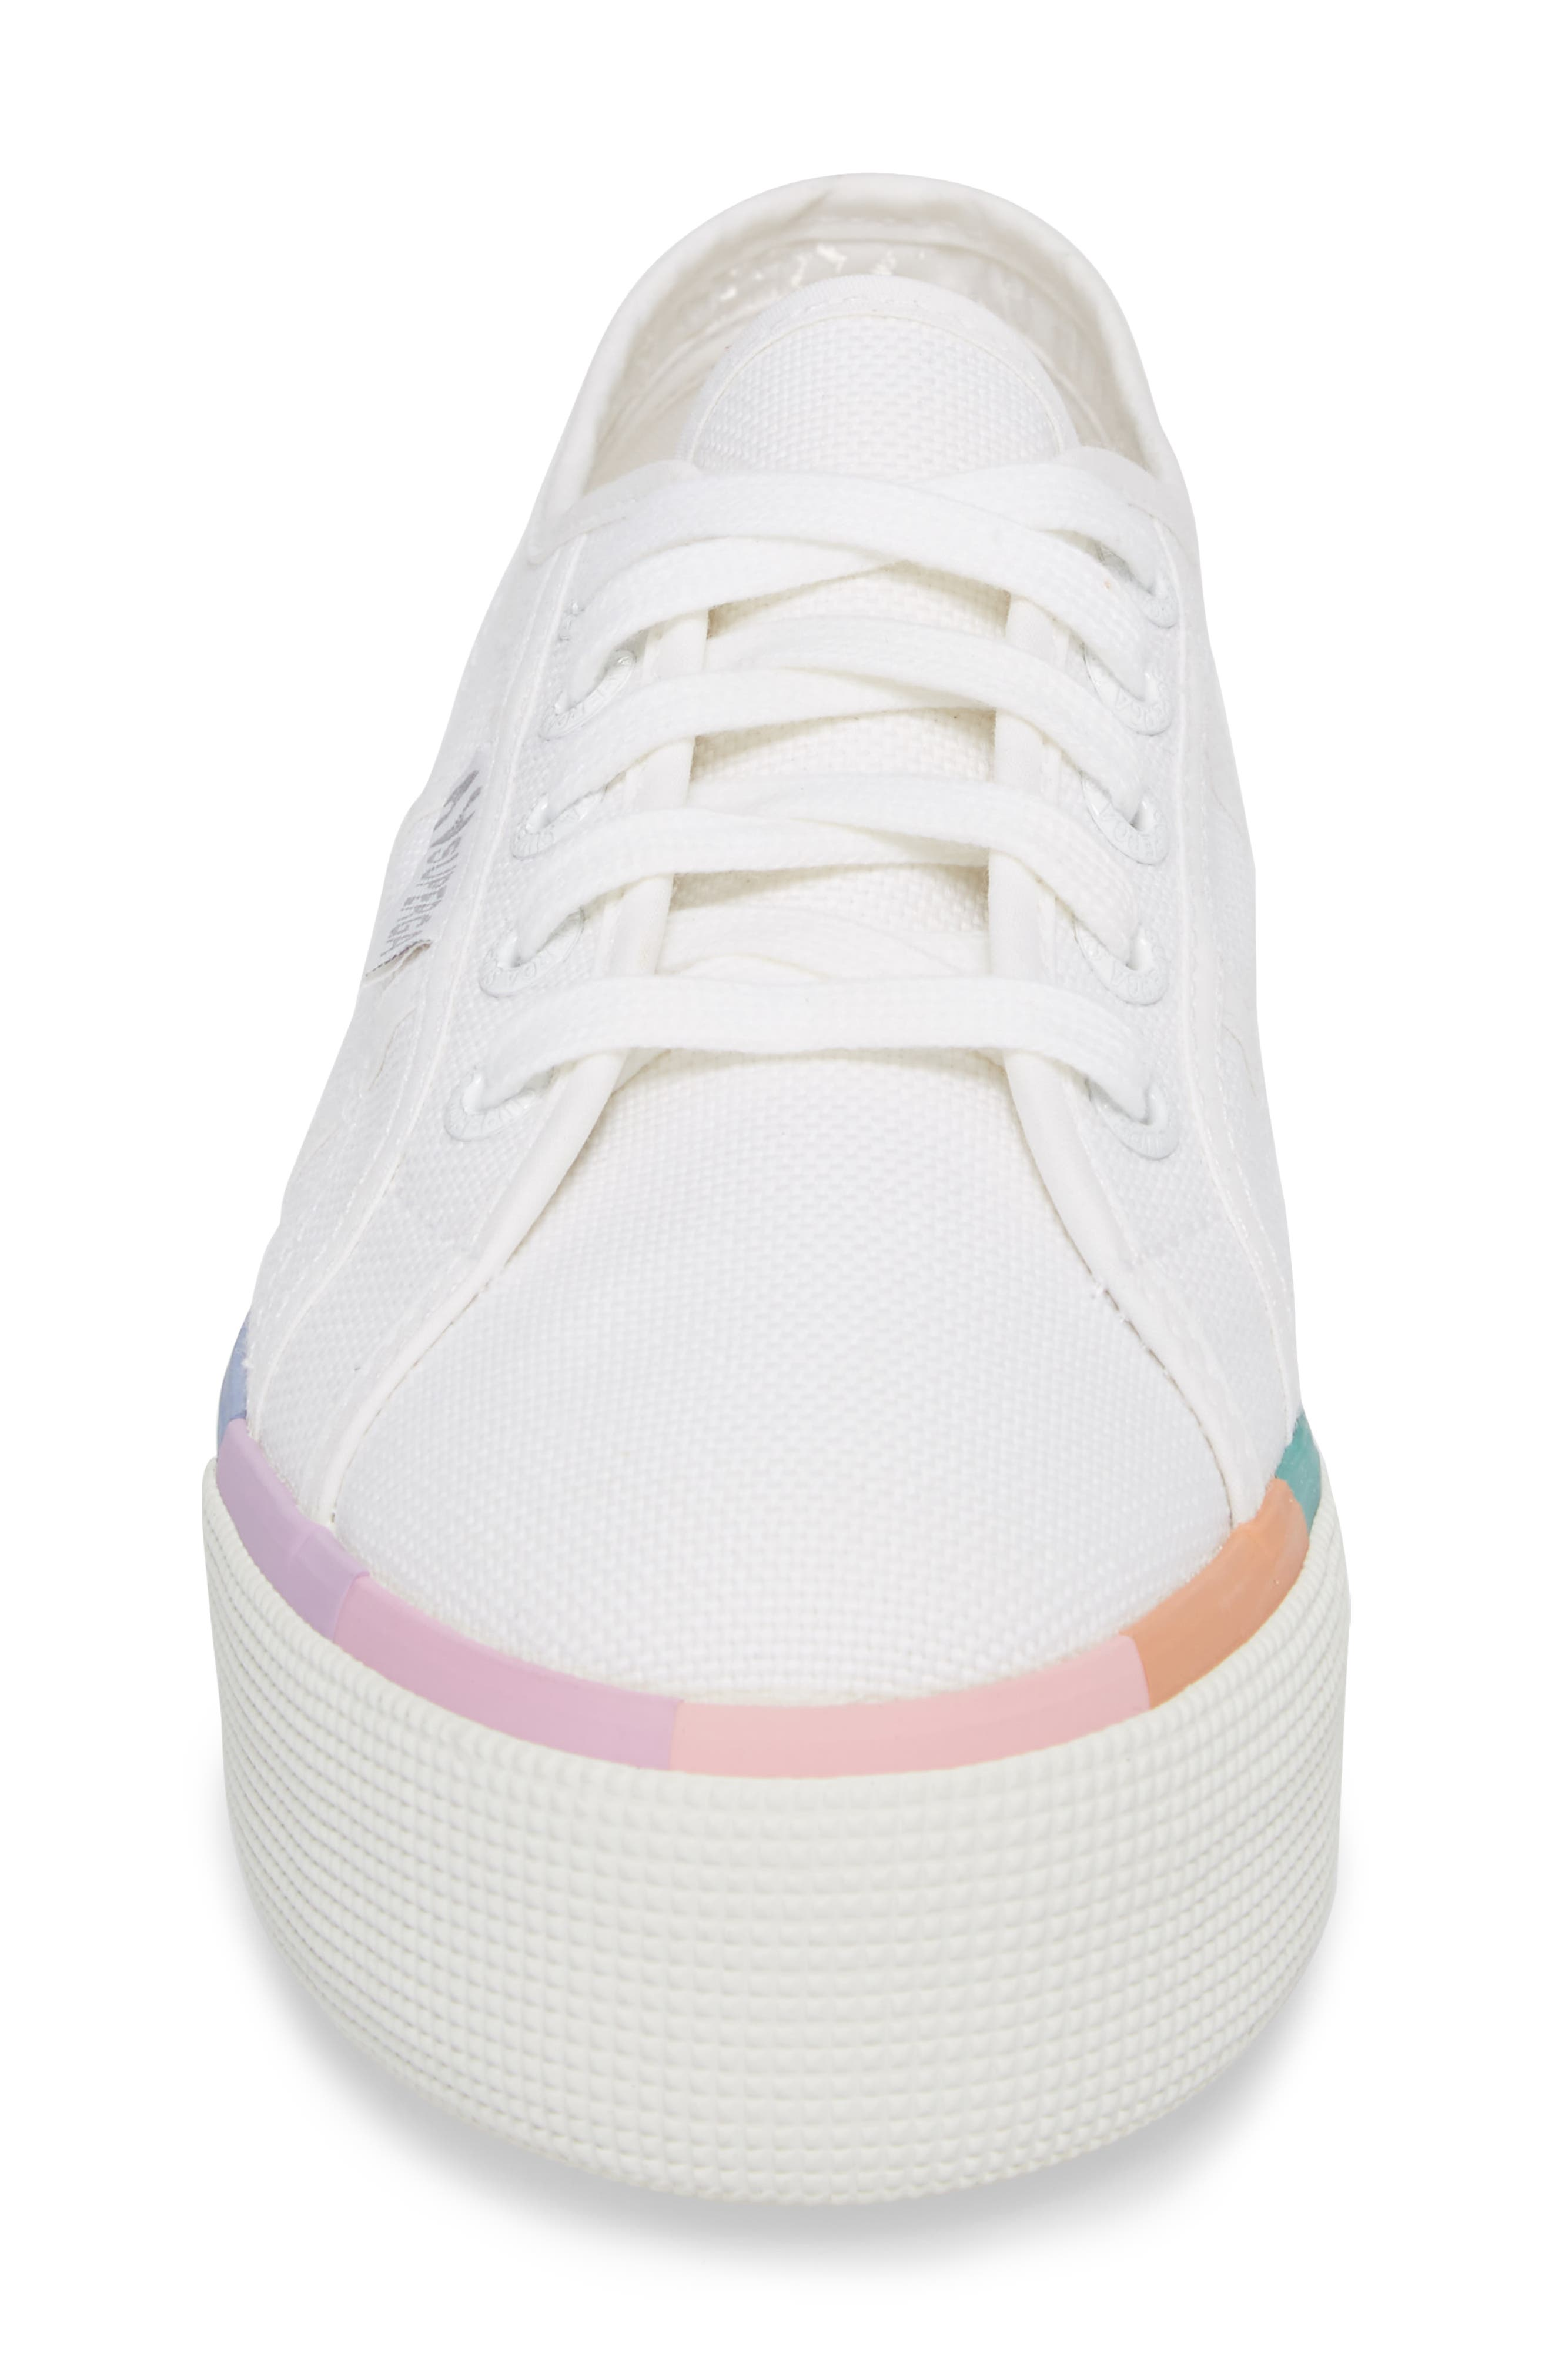 2790 Platform Sneaker,                             Alternate thumbnail 4, color,                             100